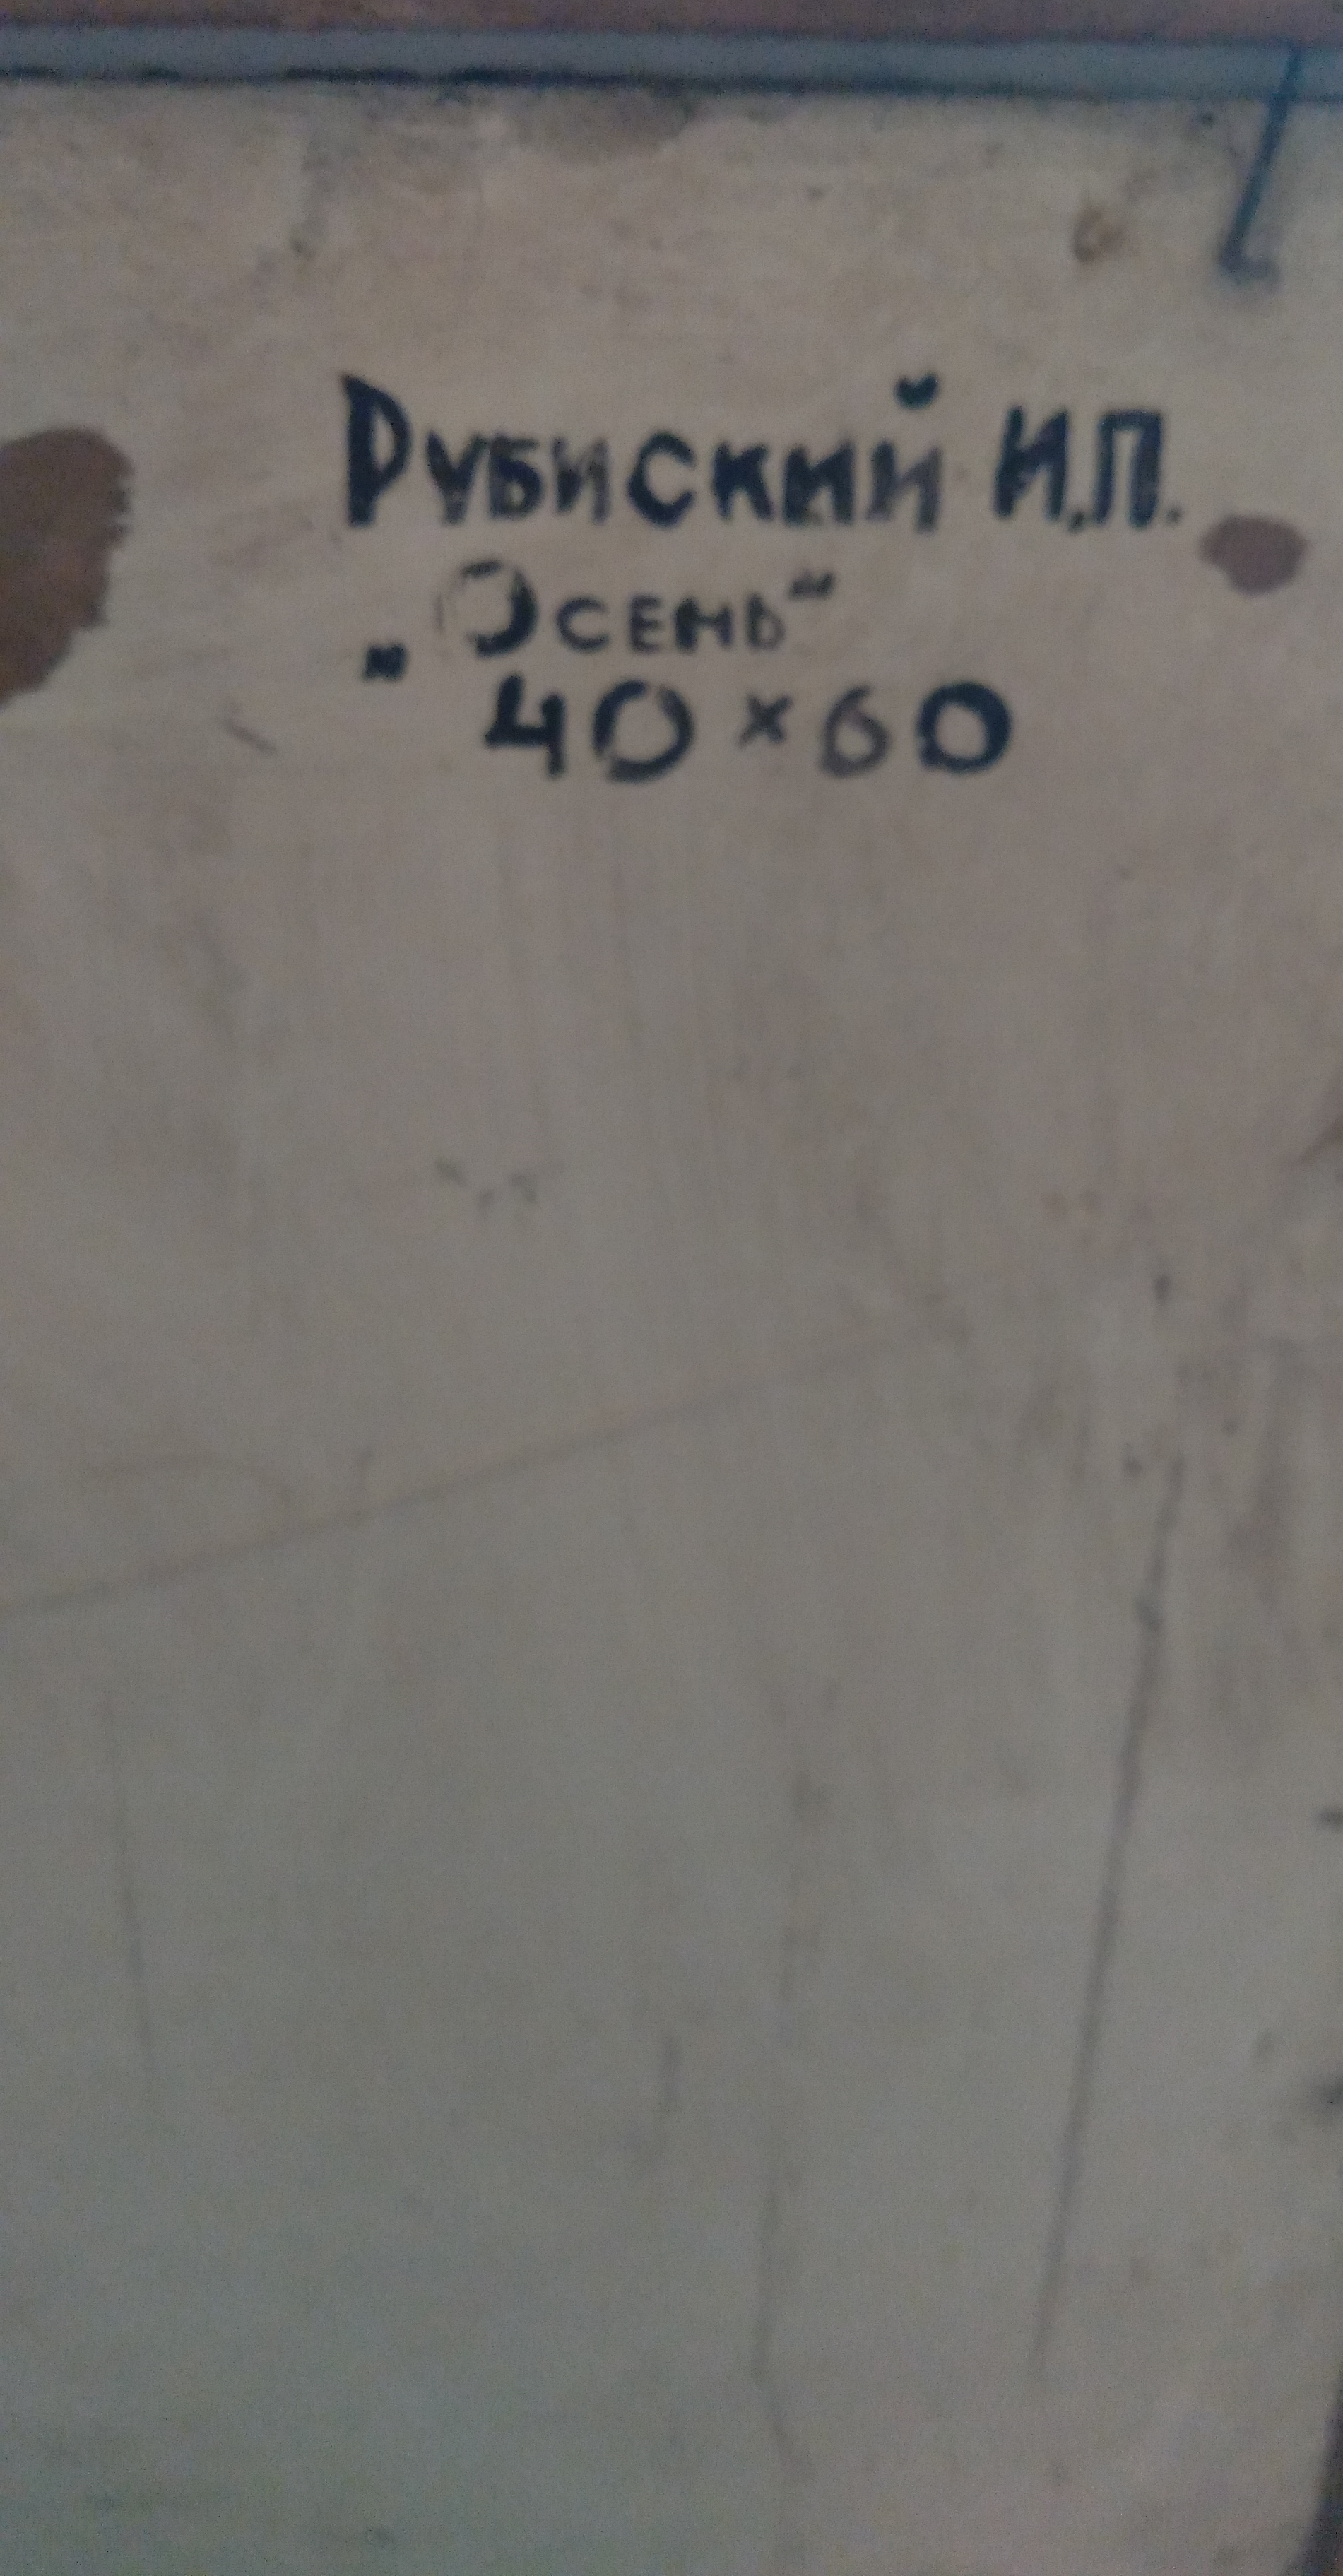 Рубиский И.П.Осень 40-60 см., картон, масло 1975 год - 2